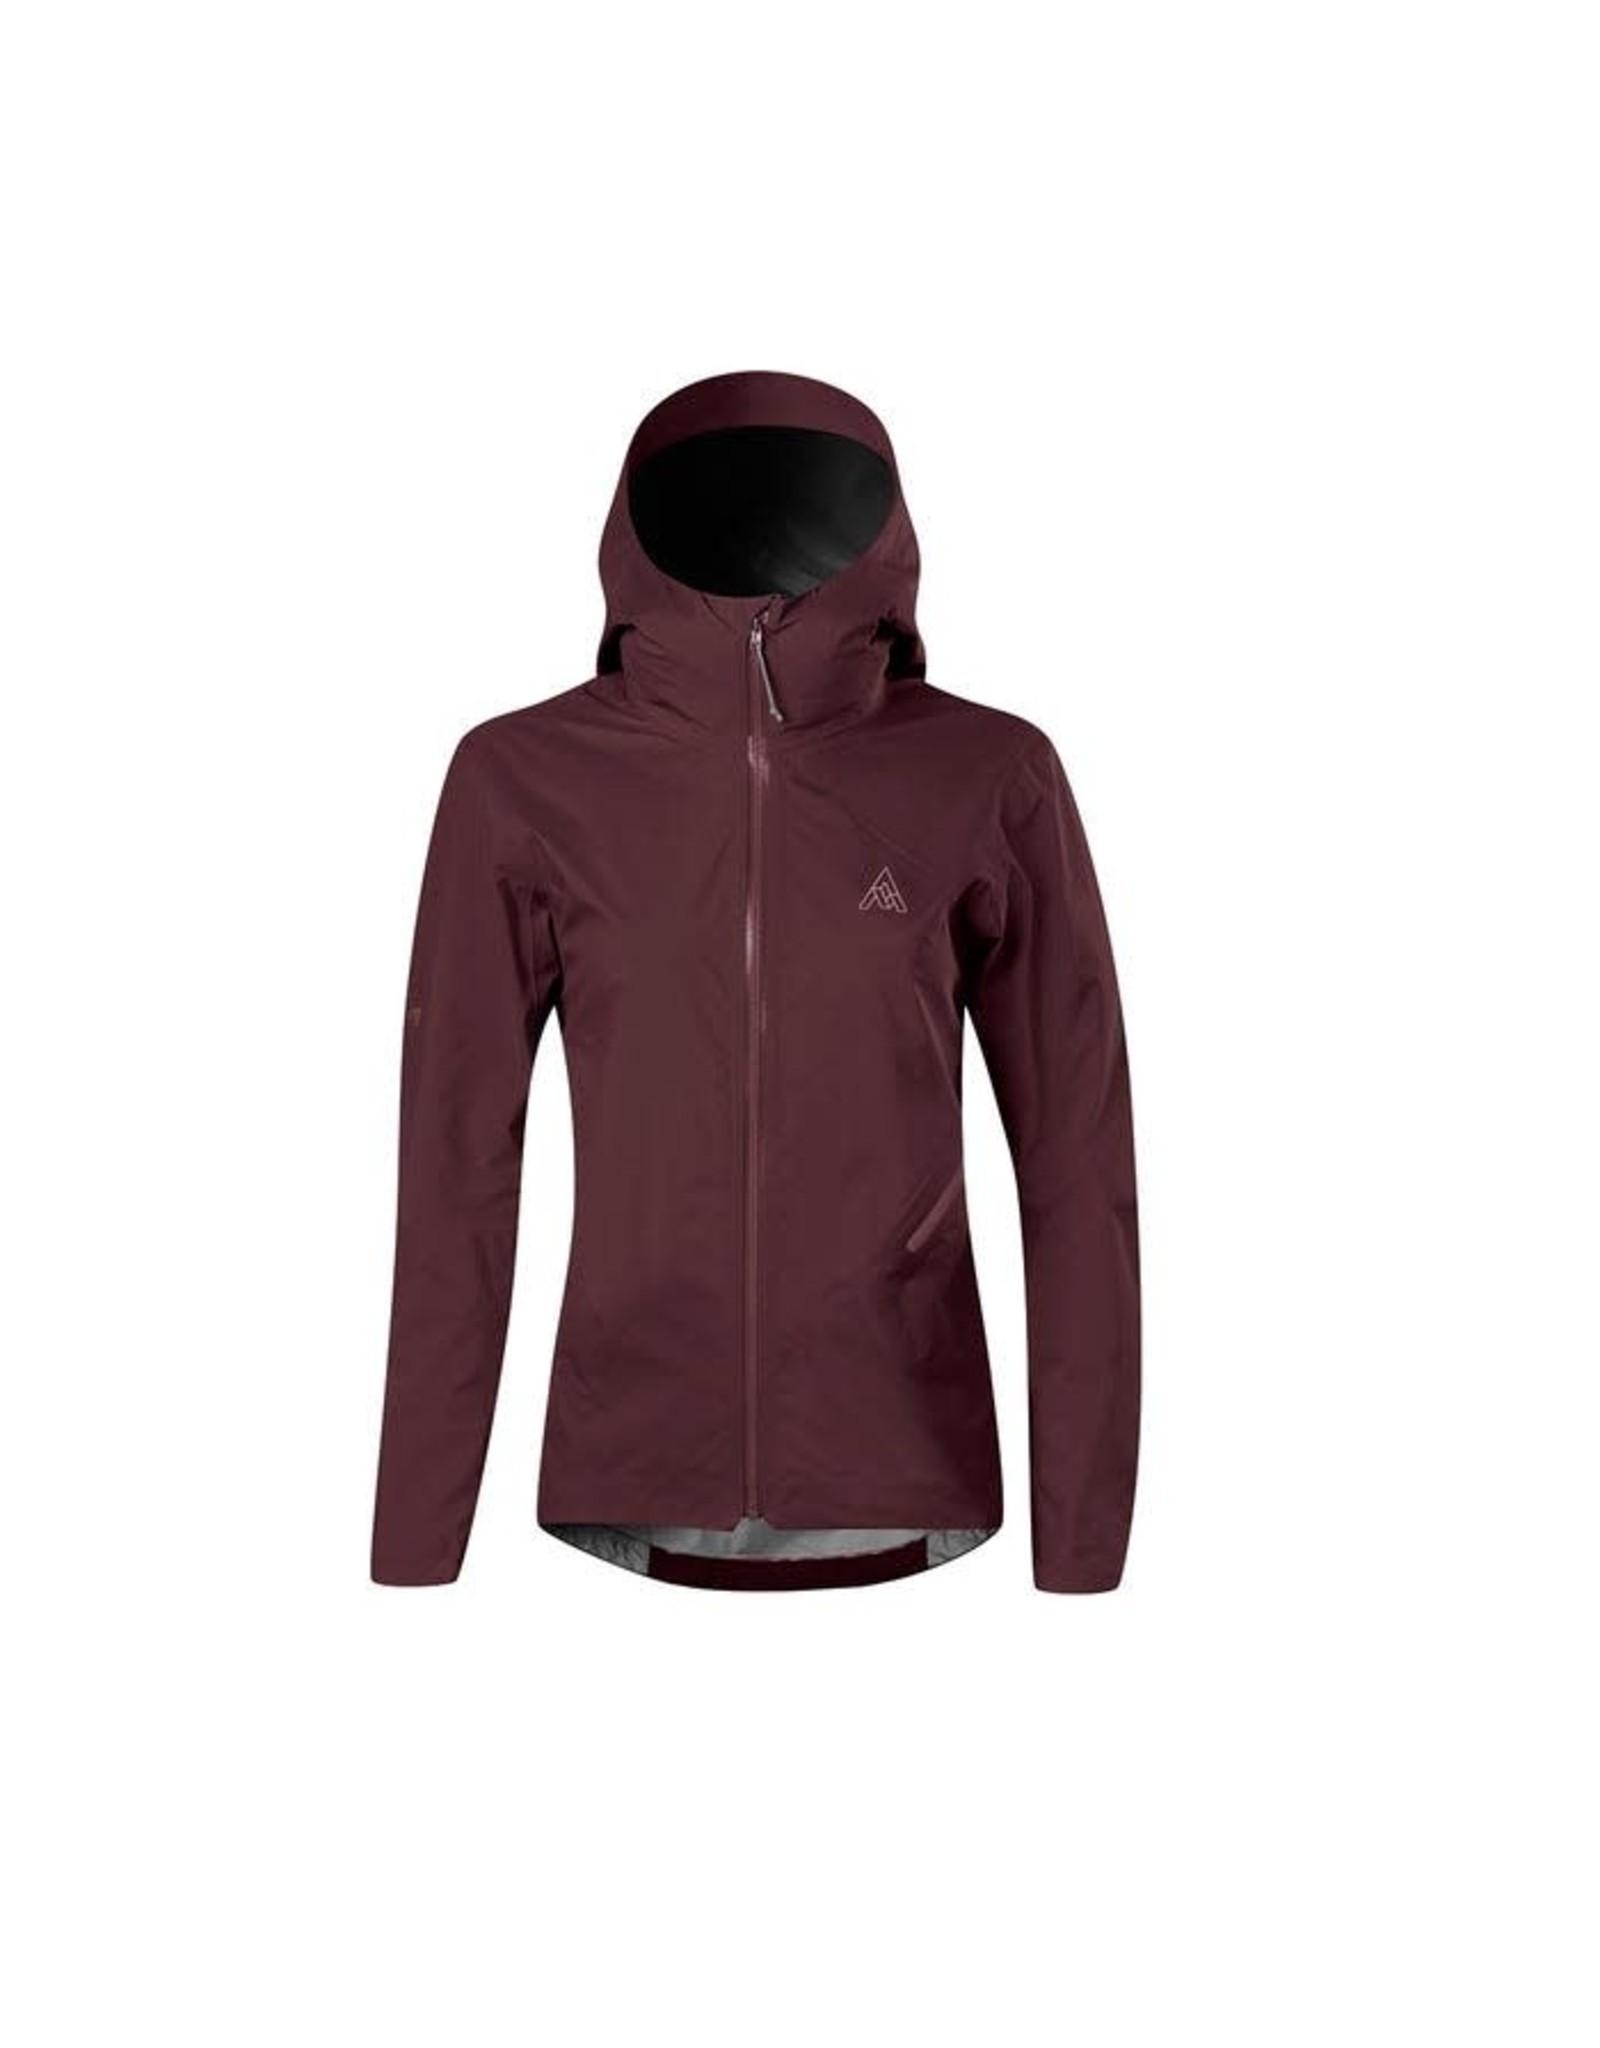 7MESH 7MESH - Copilot Jacket Port Women's Med